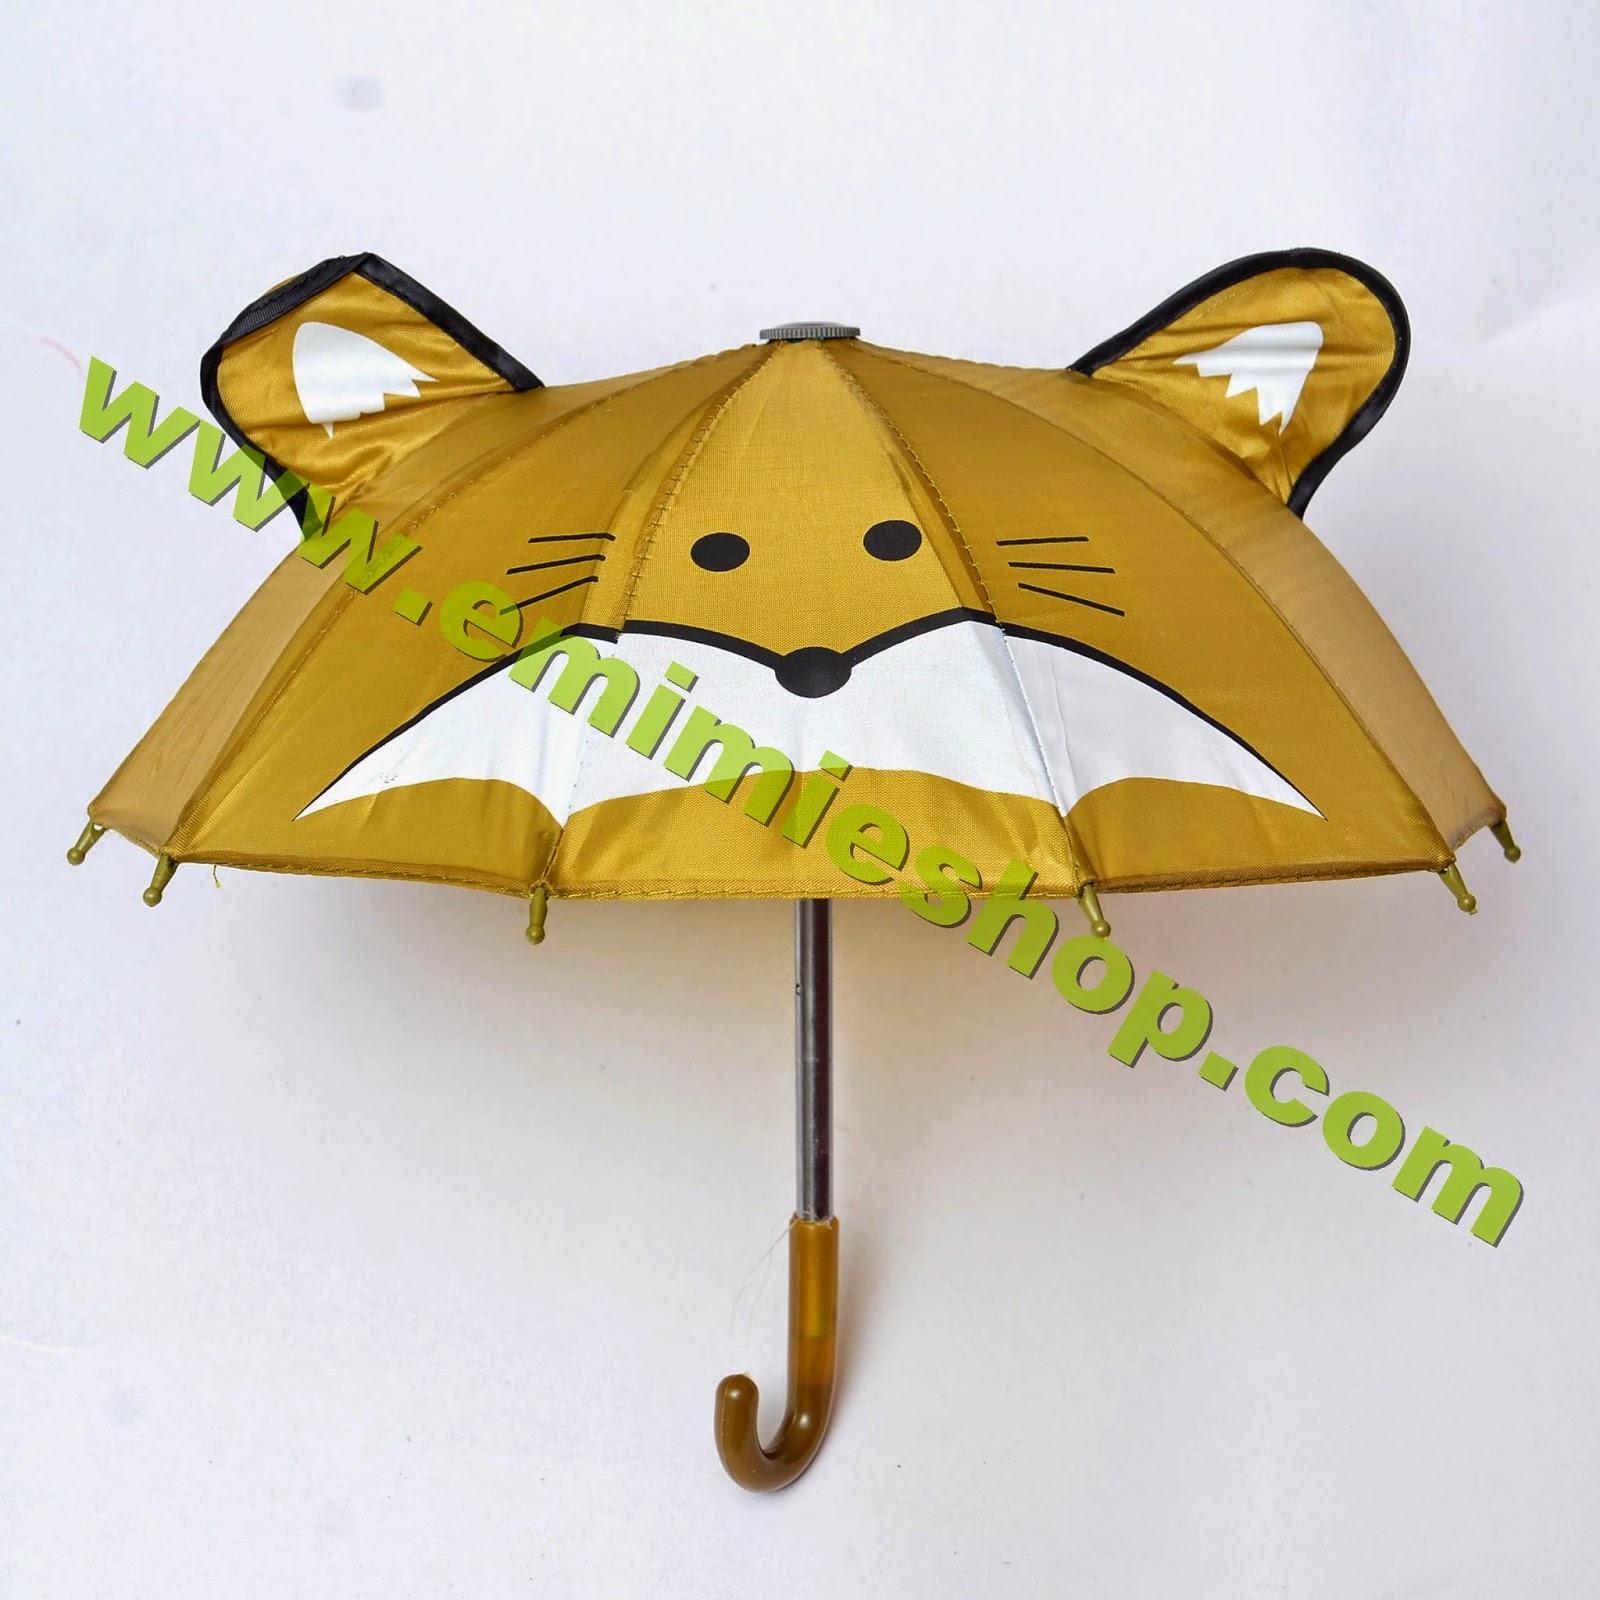 Payung Kuping Mini